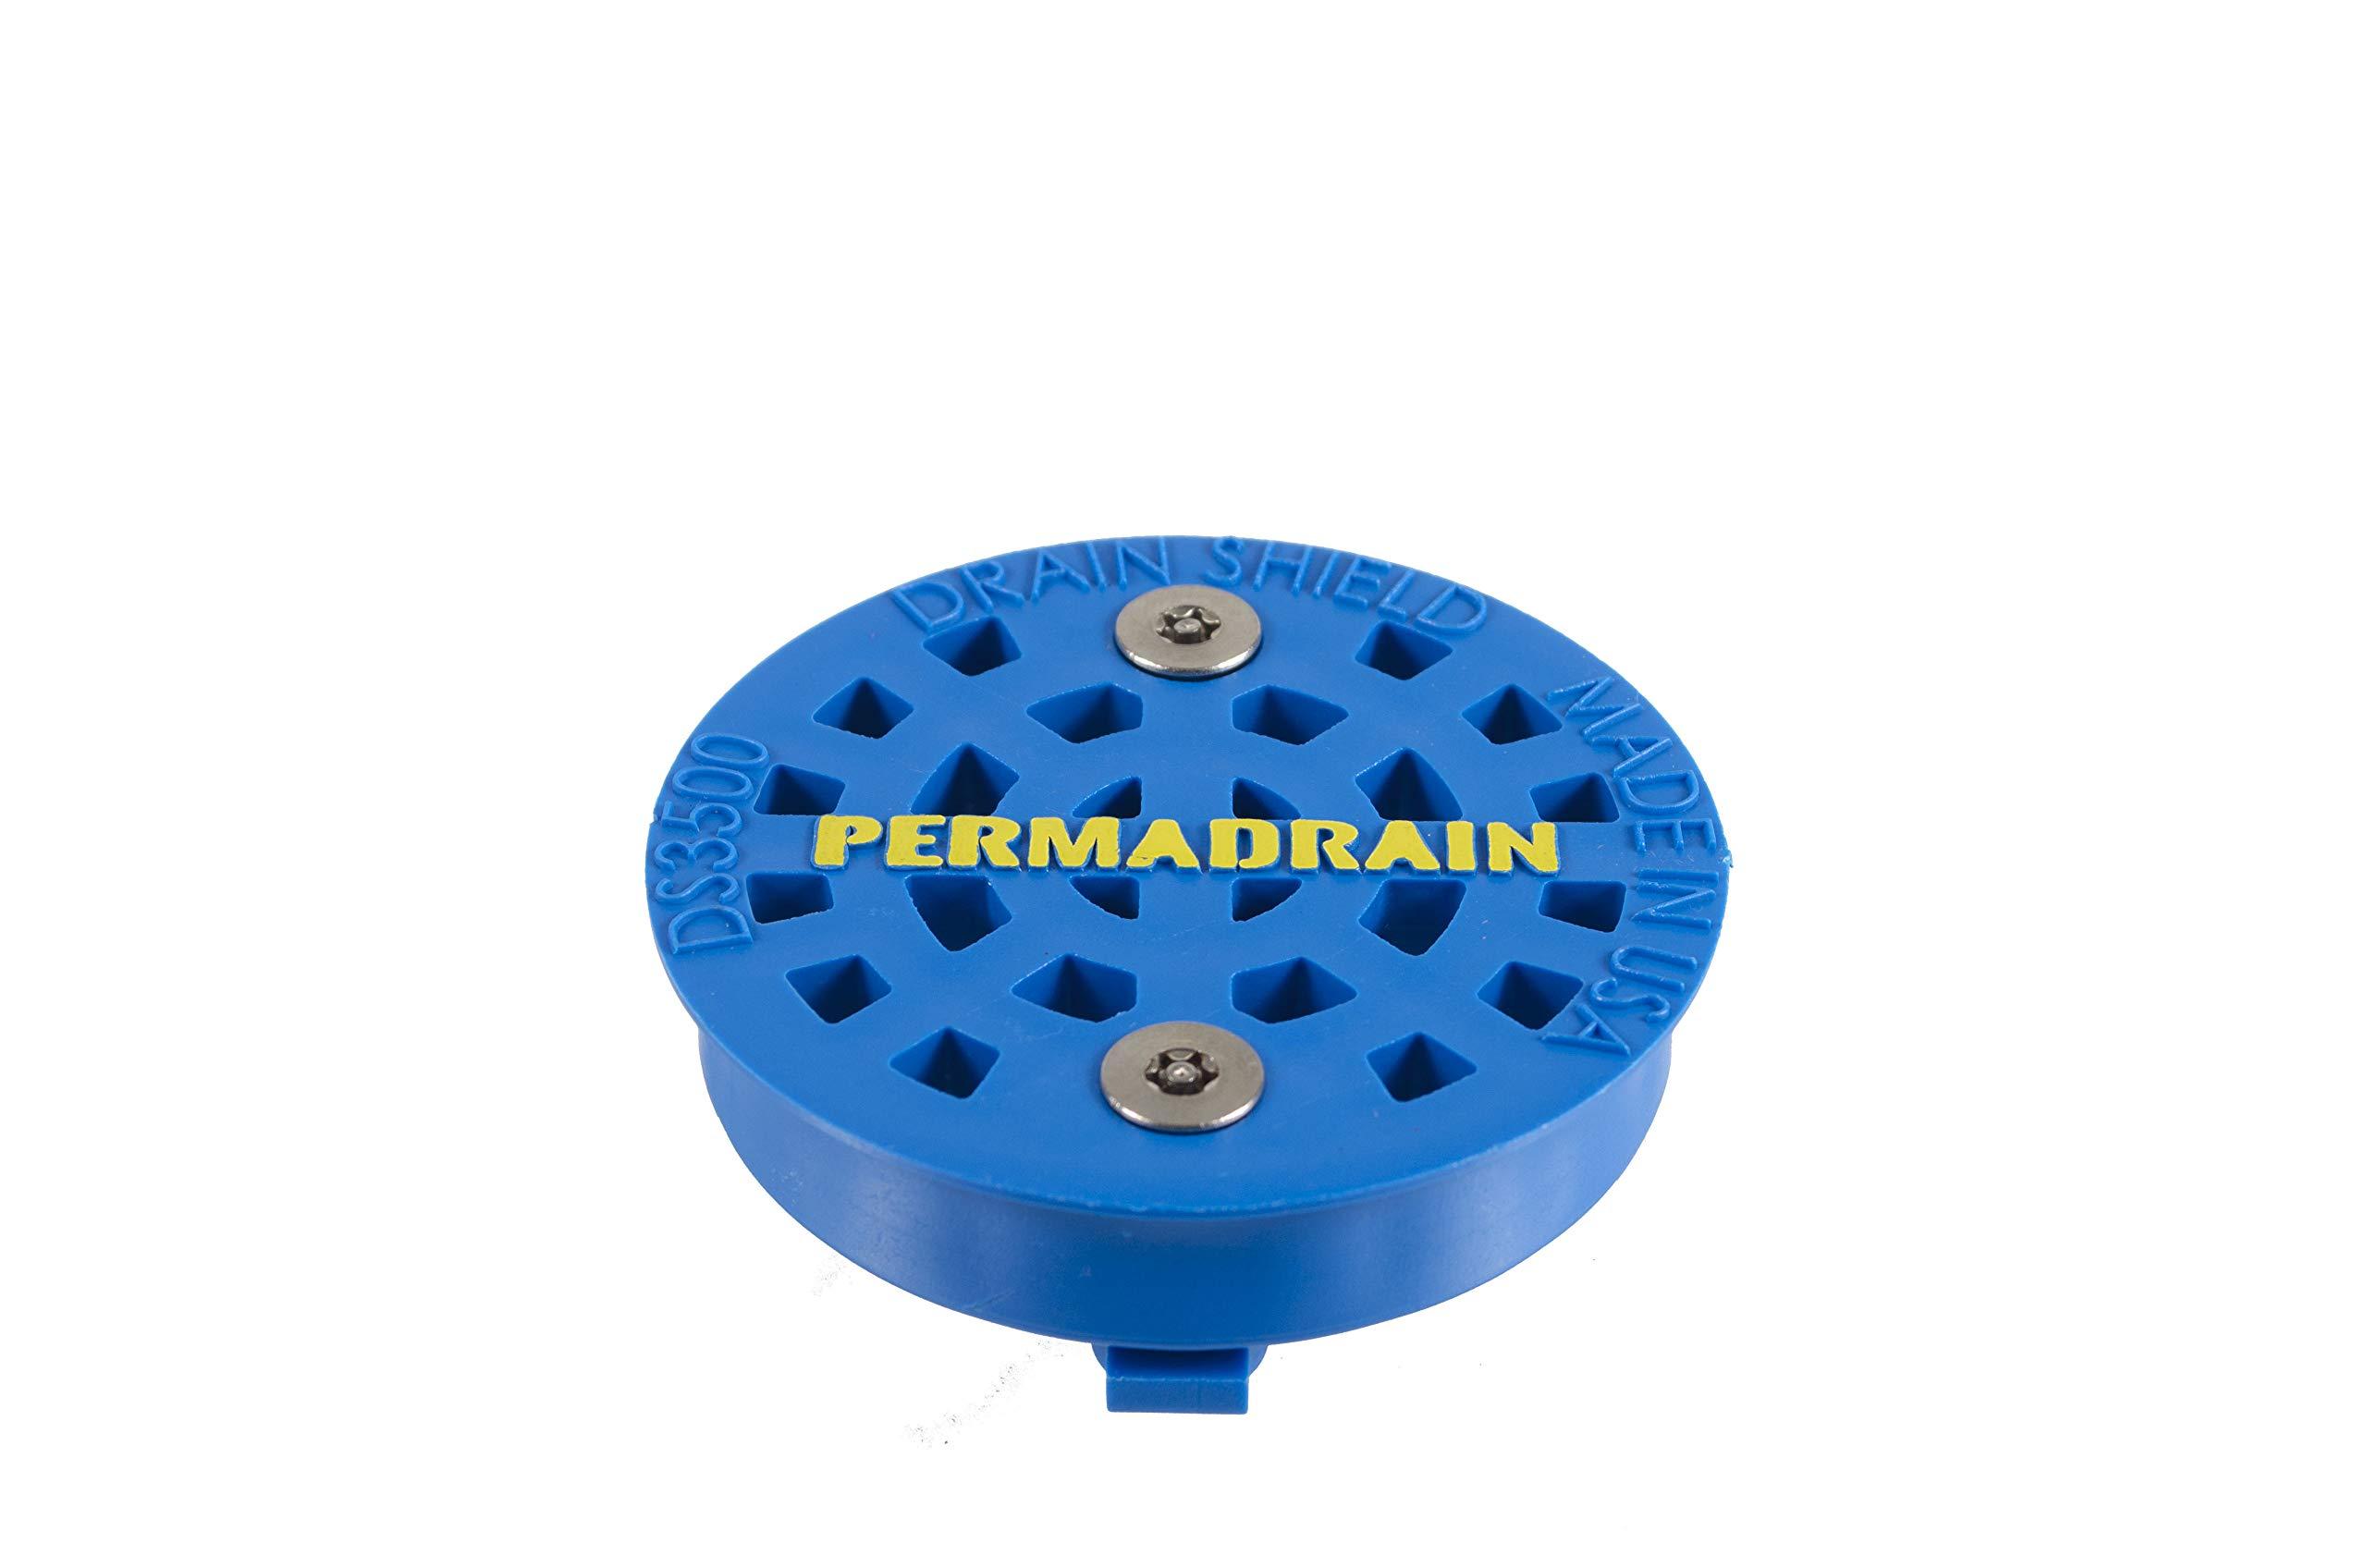 DrainShield 3.5'' Commercial Sink Strainer that Locks